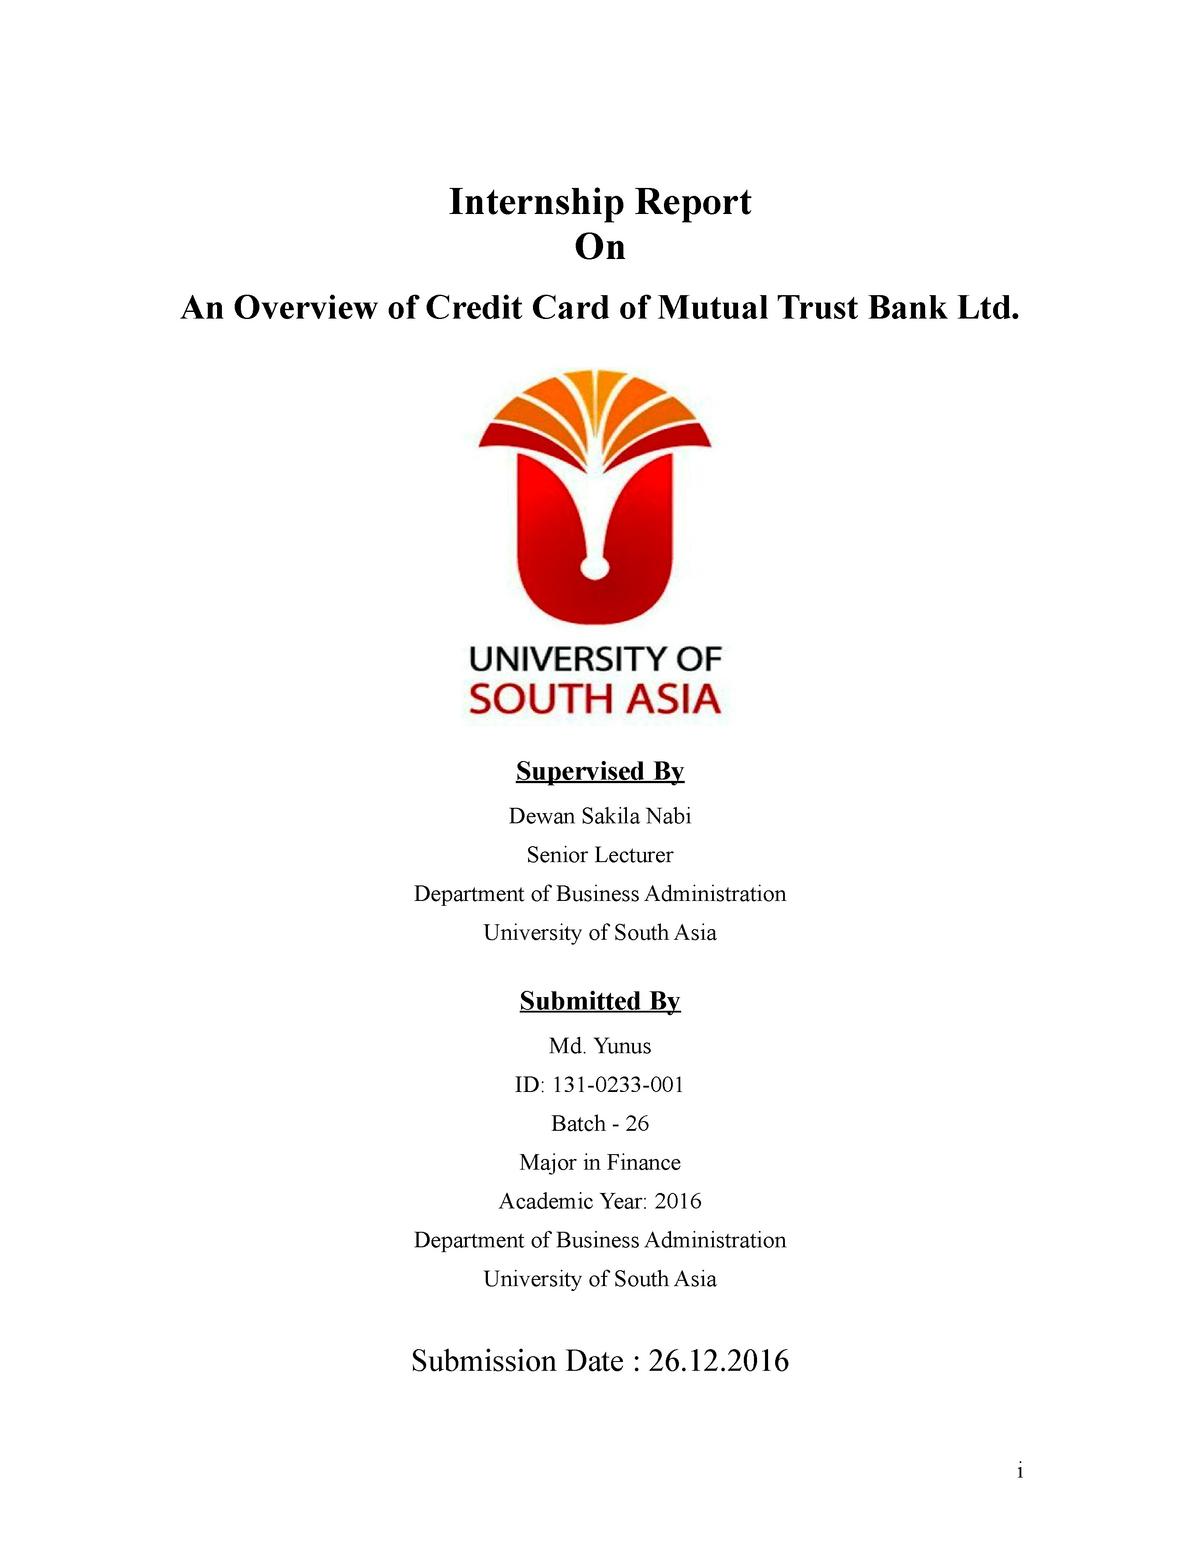 Internship Report - BBA Finance 131 - StuDocu